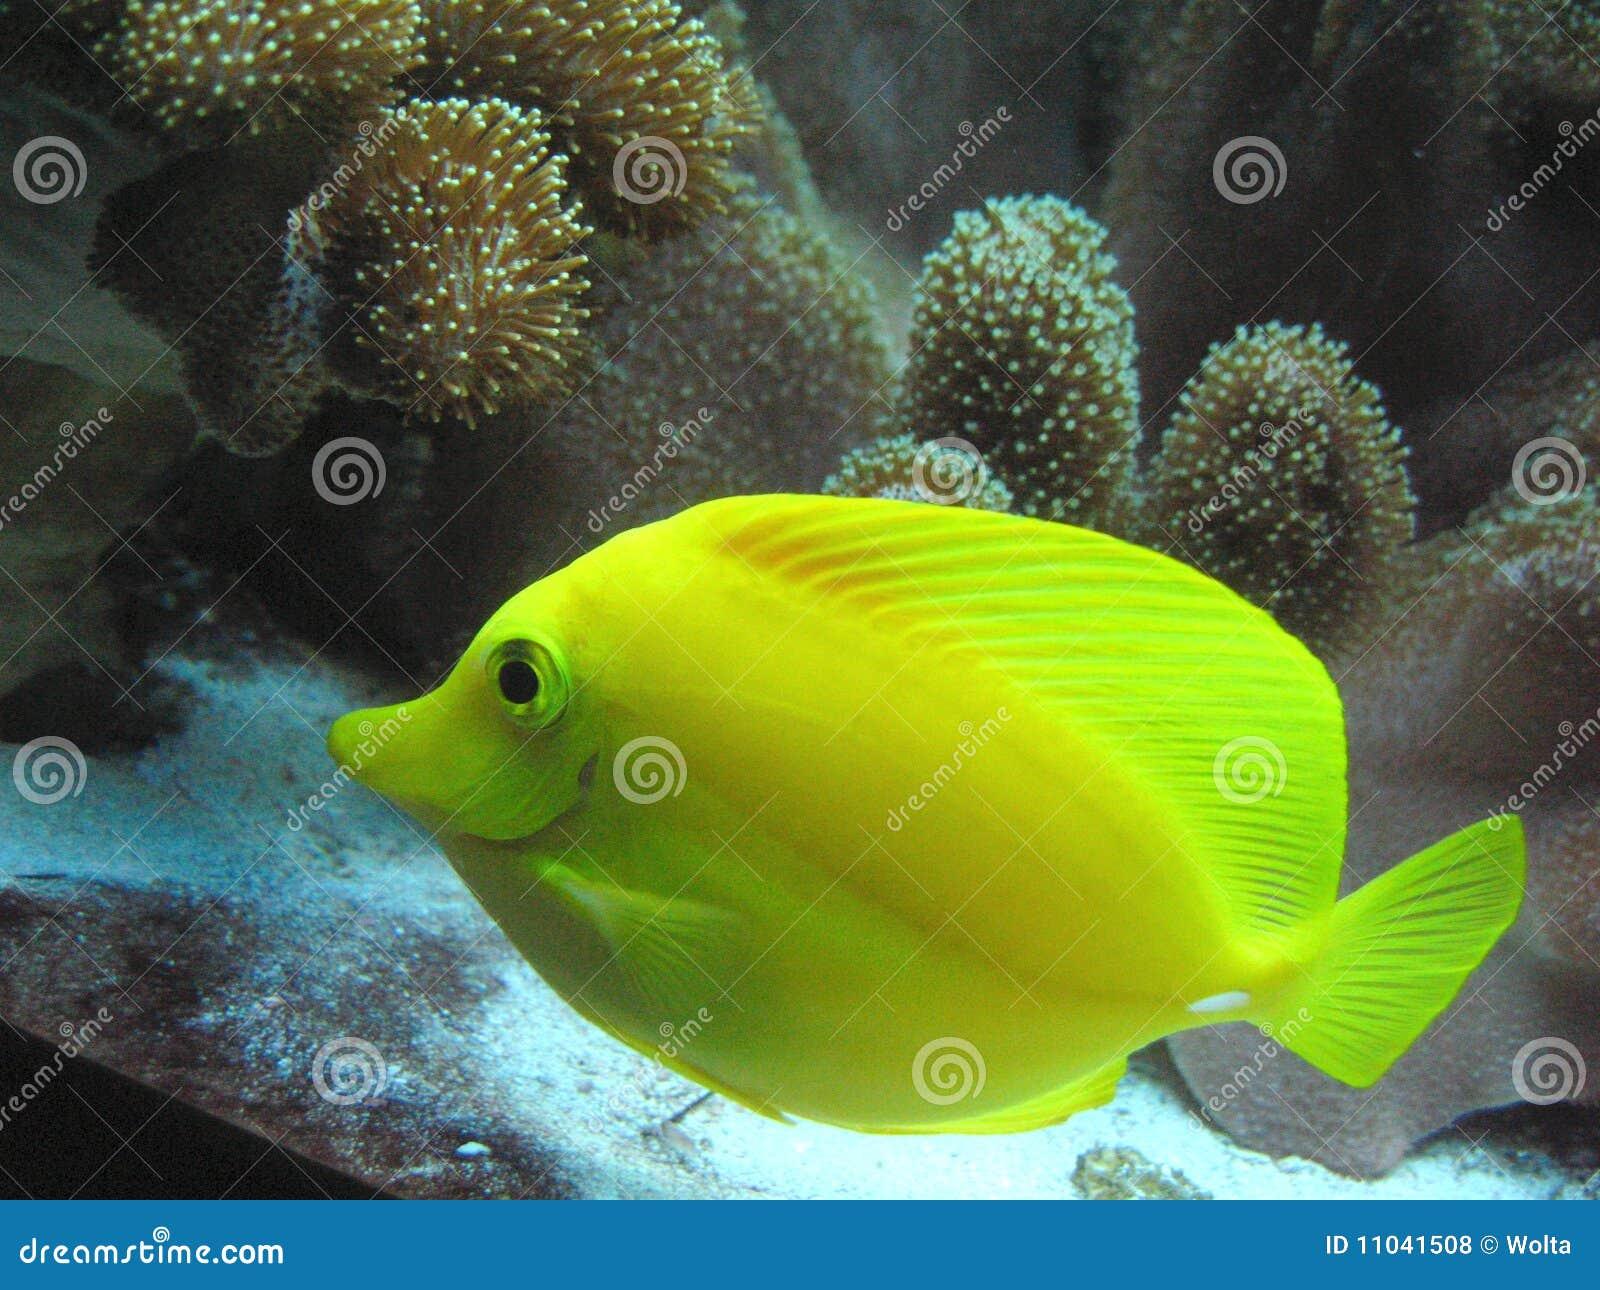 Tropical fish yellow aquarium fish yellow tang fish for Aquarium fish net